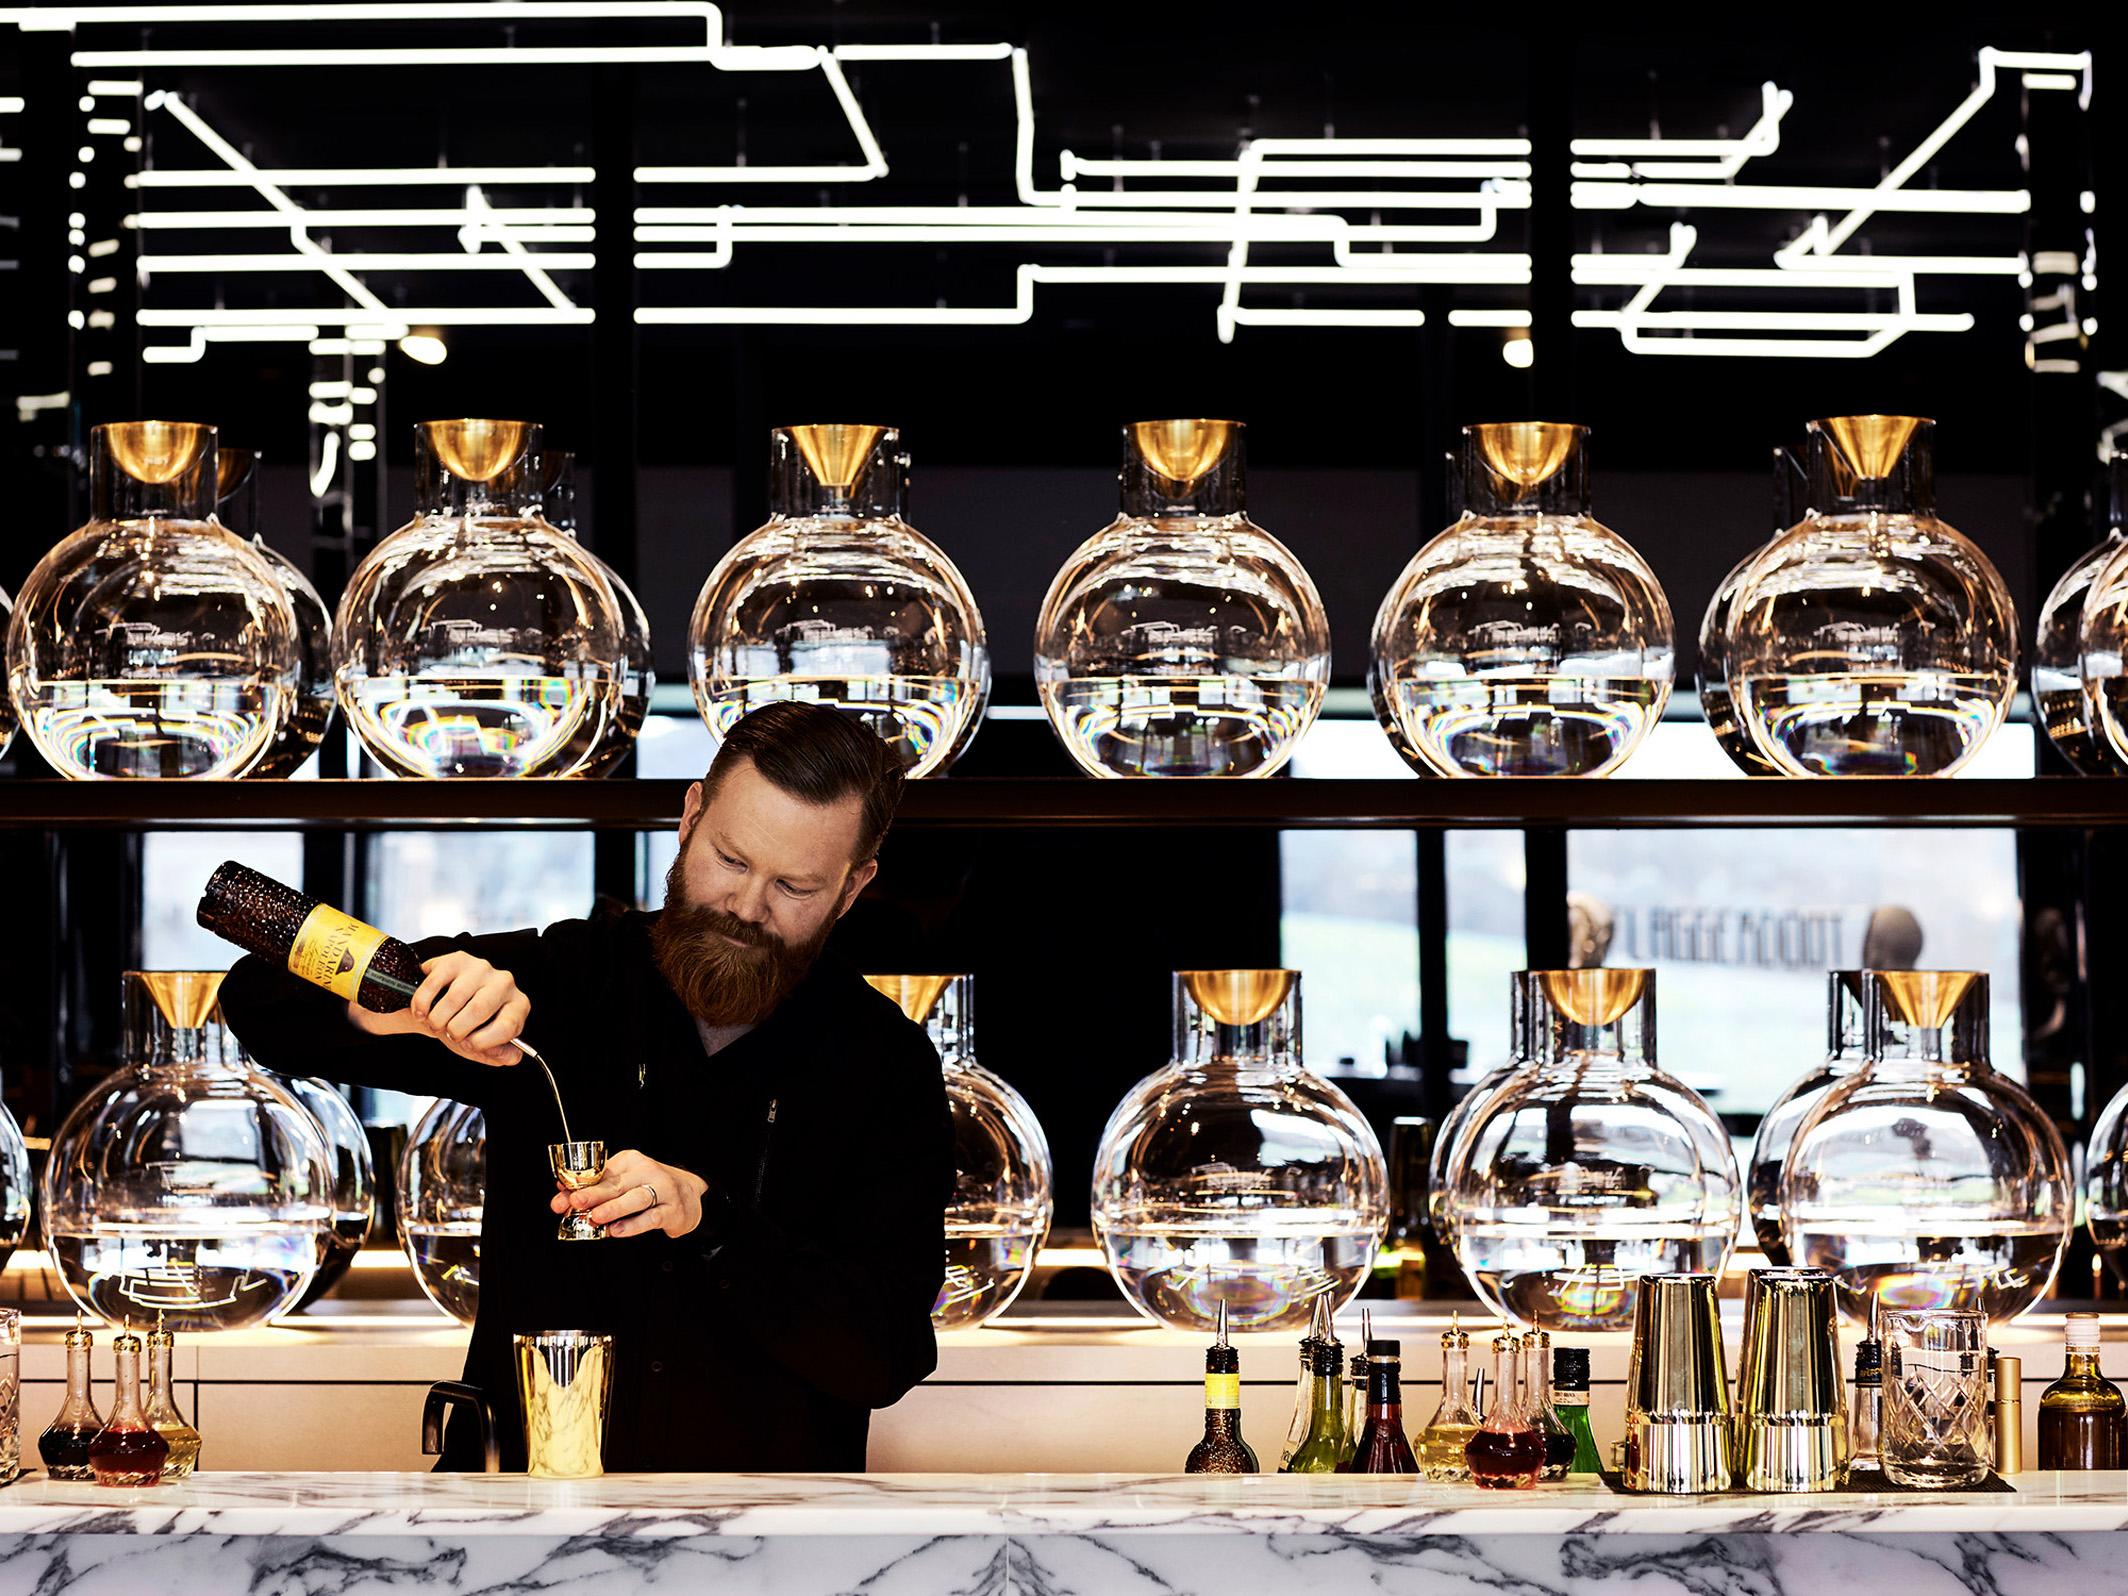 Studio Ongarato Wins Global Hospitality Design Award